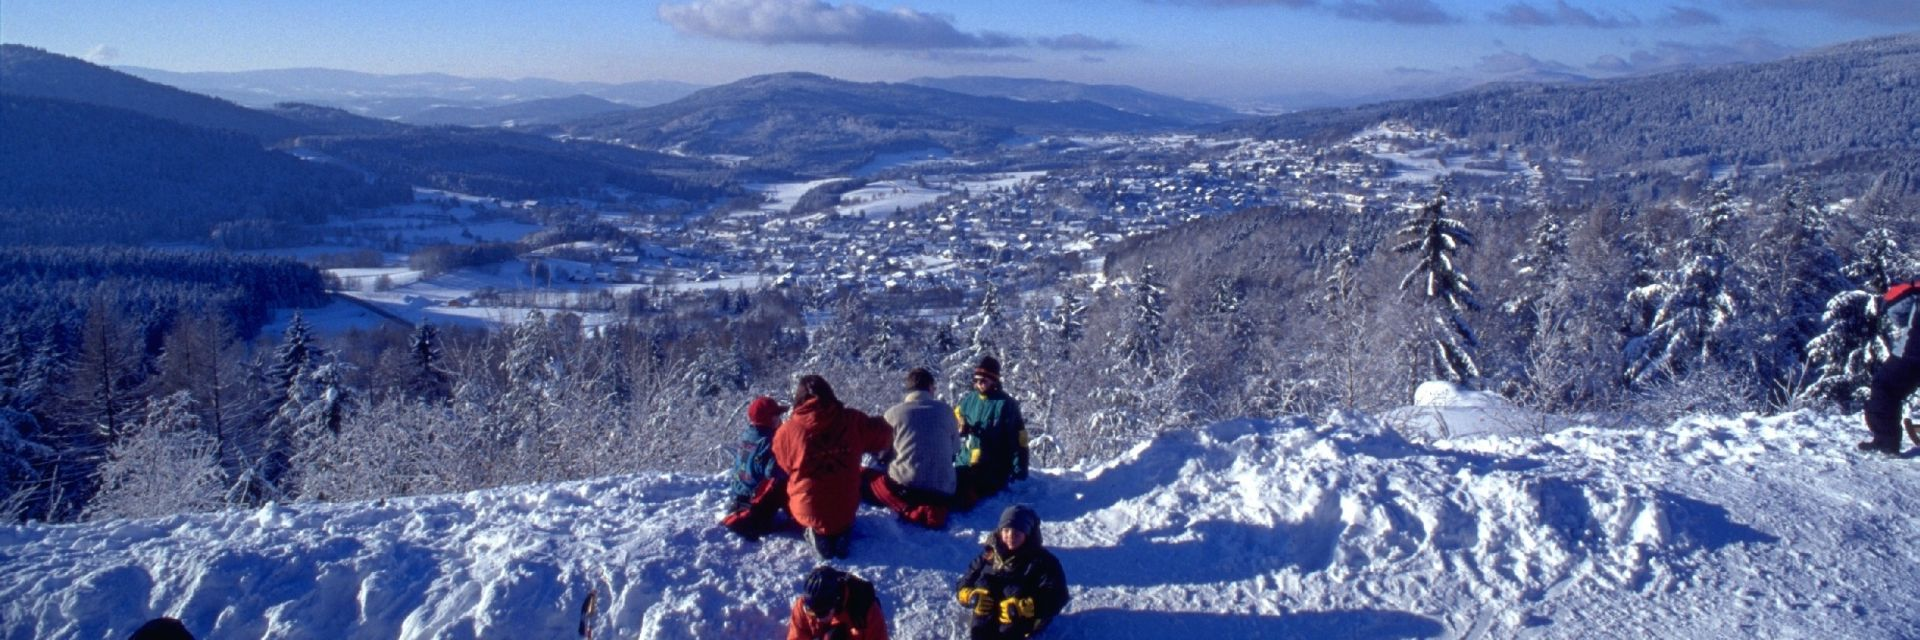 kirchberg-im-wald-touristinfo-skifahren-winterurlaub